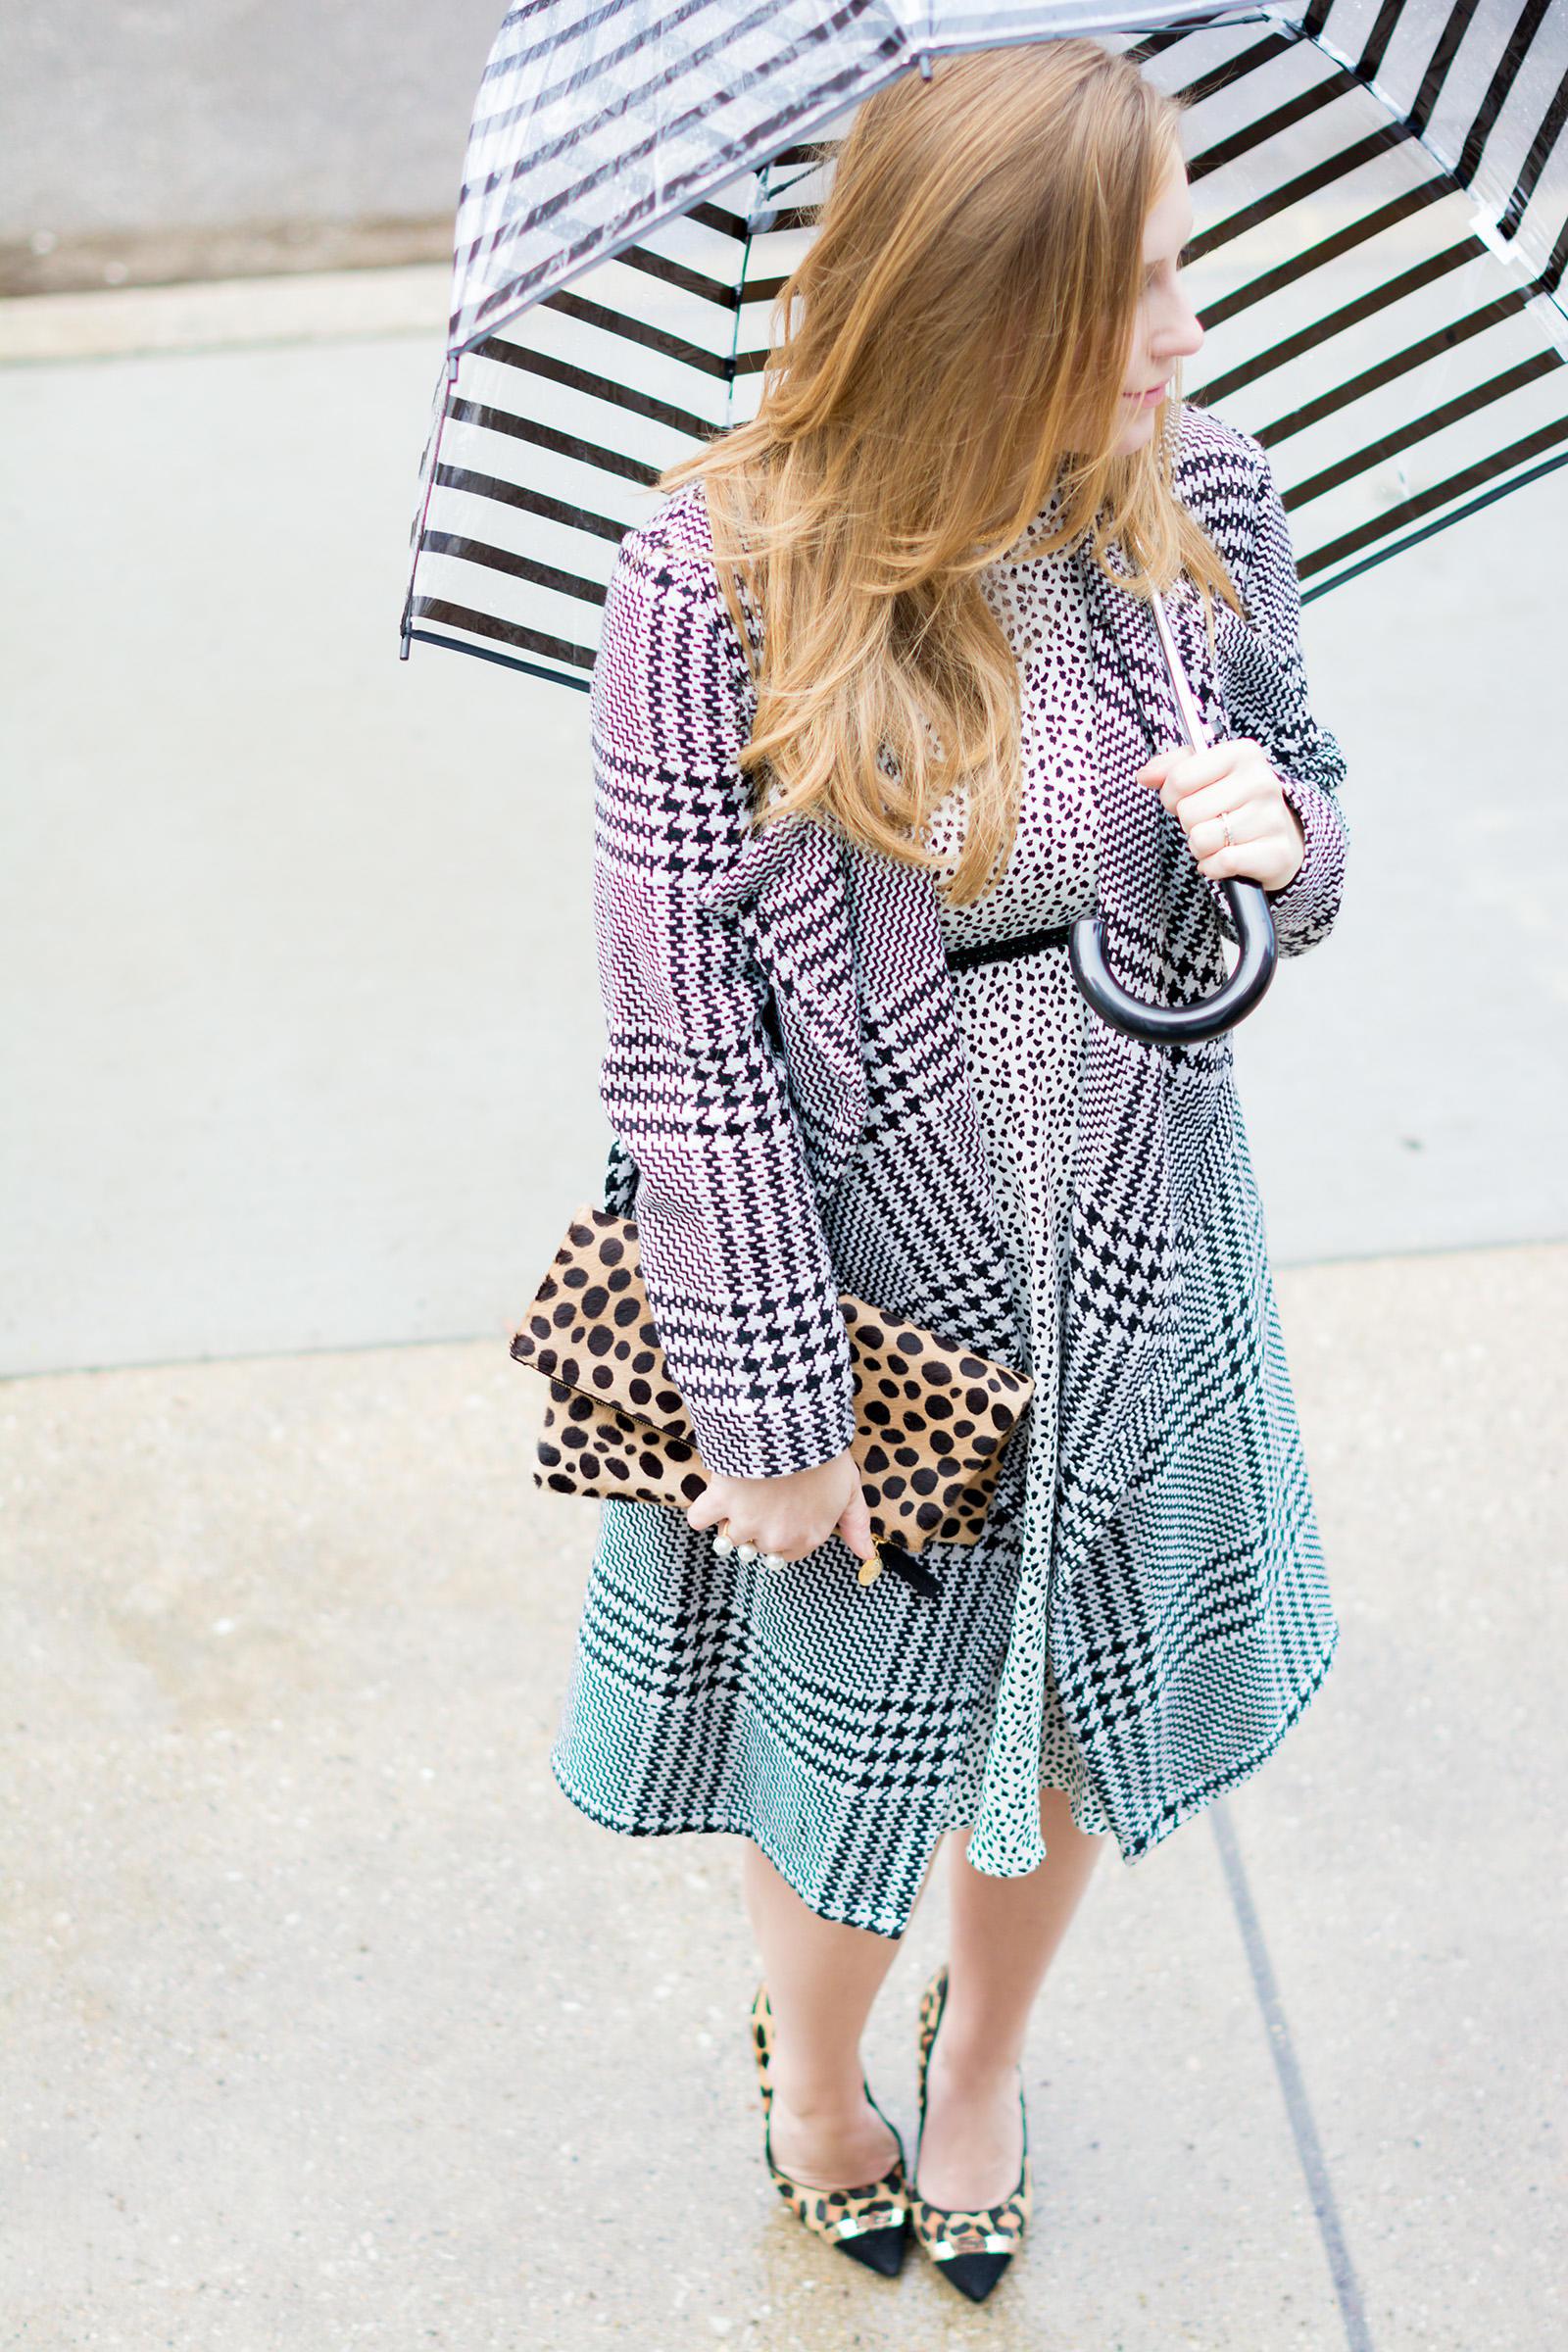 April Showers Outfit Stripes-43059